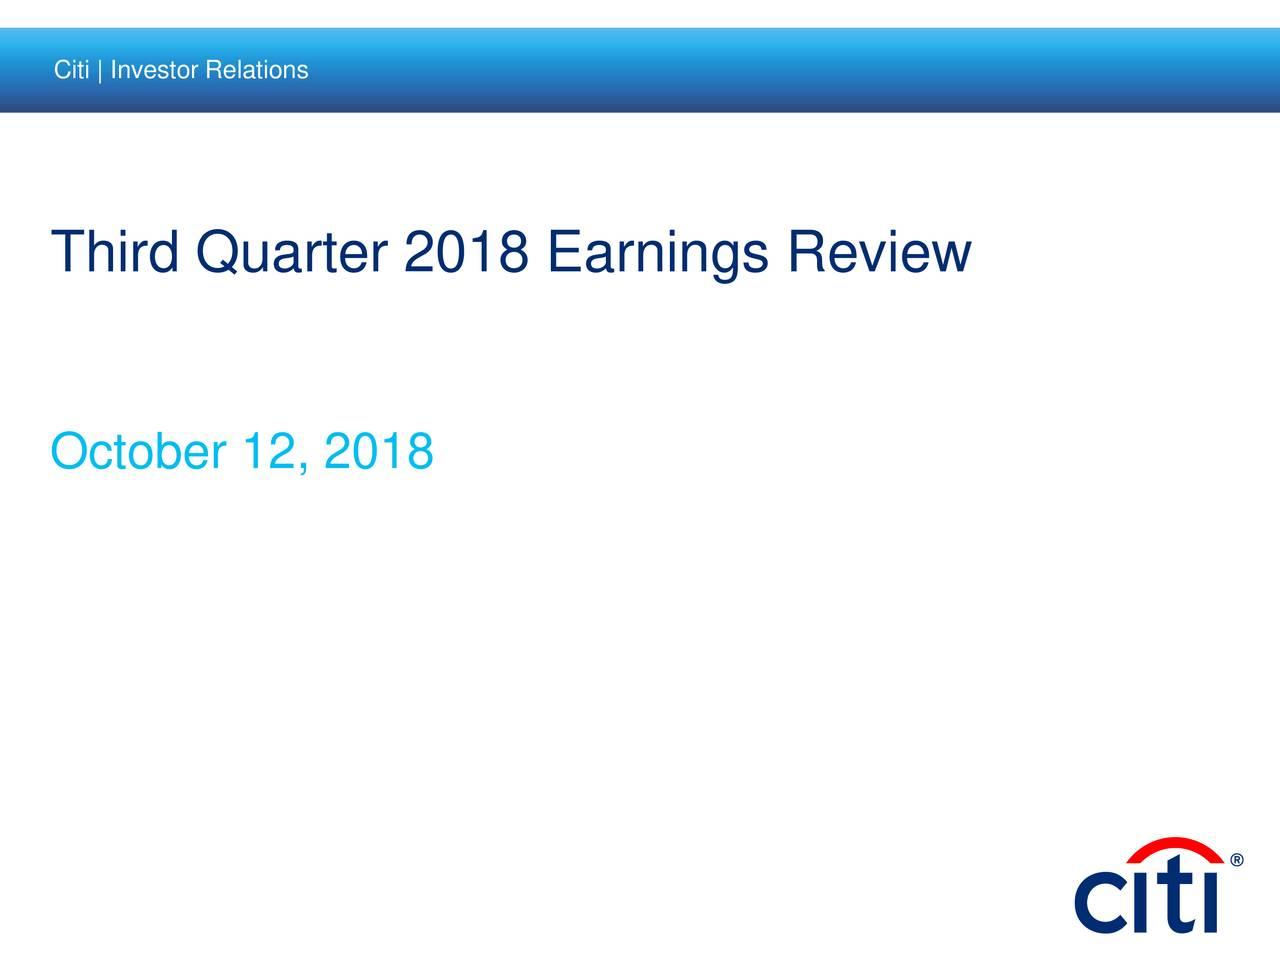 Third Quarter 2018 Earnings Review October 12, 2018